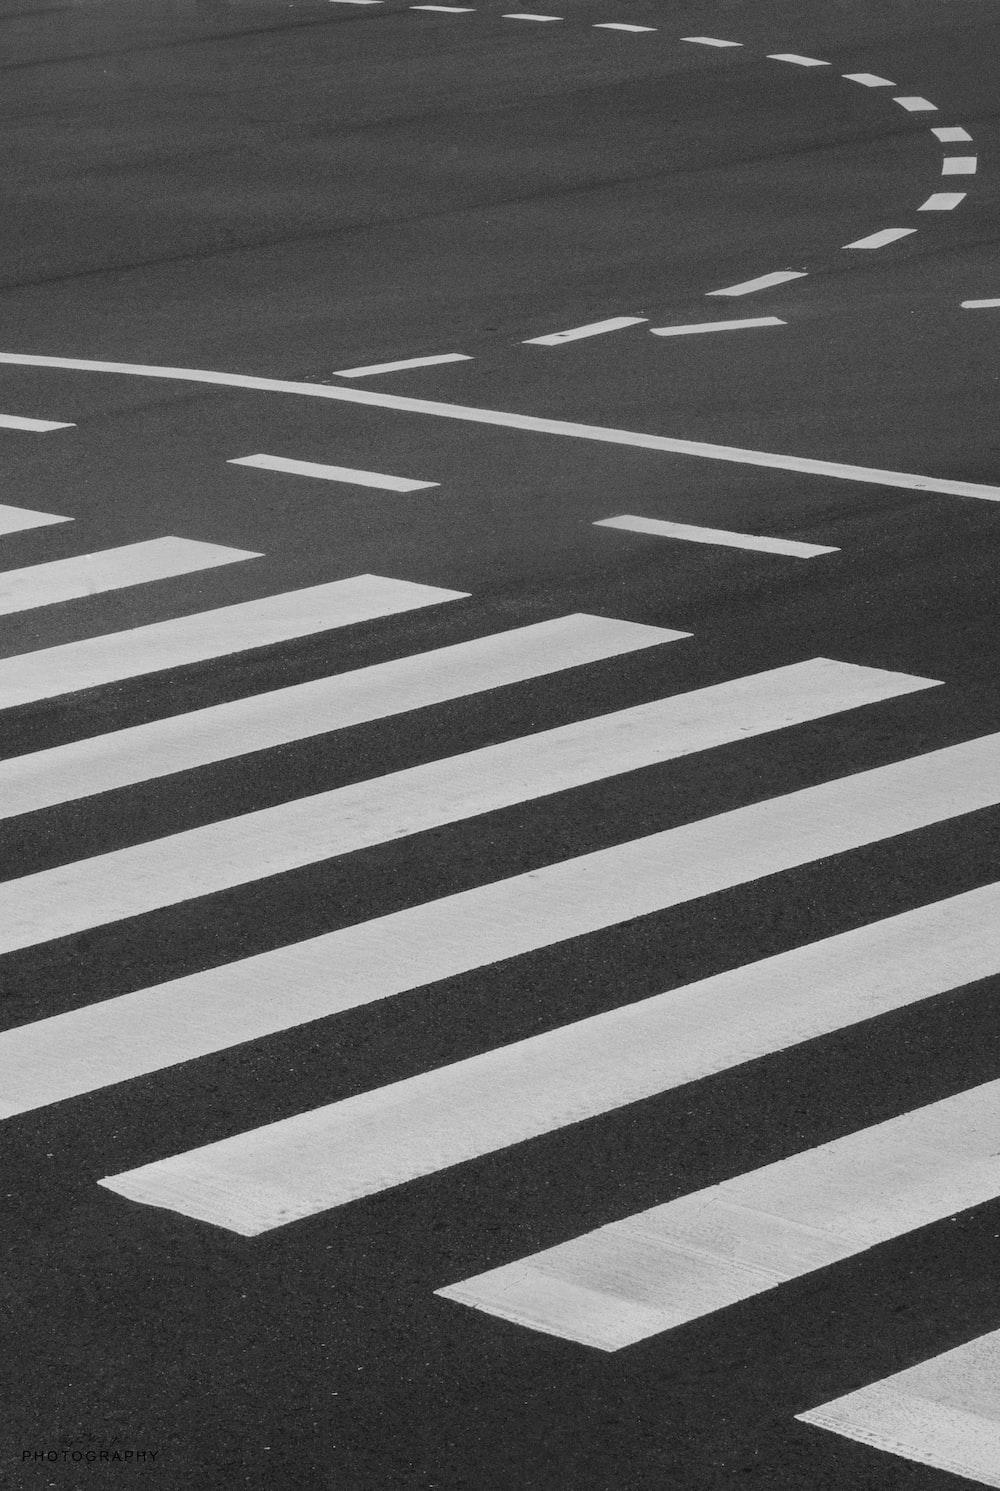 close-up photo of pedestrian lane